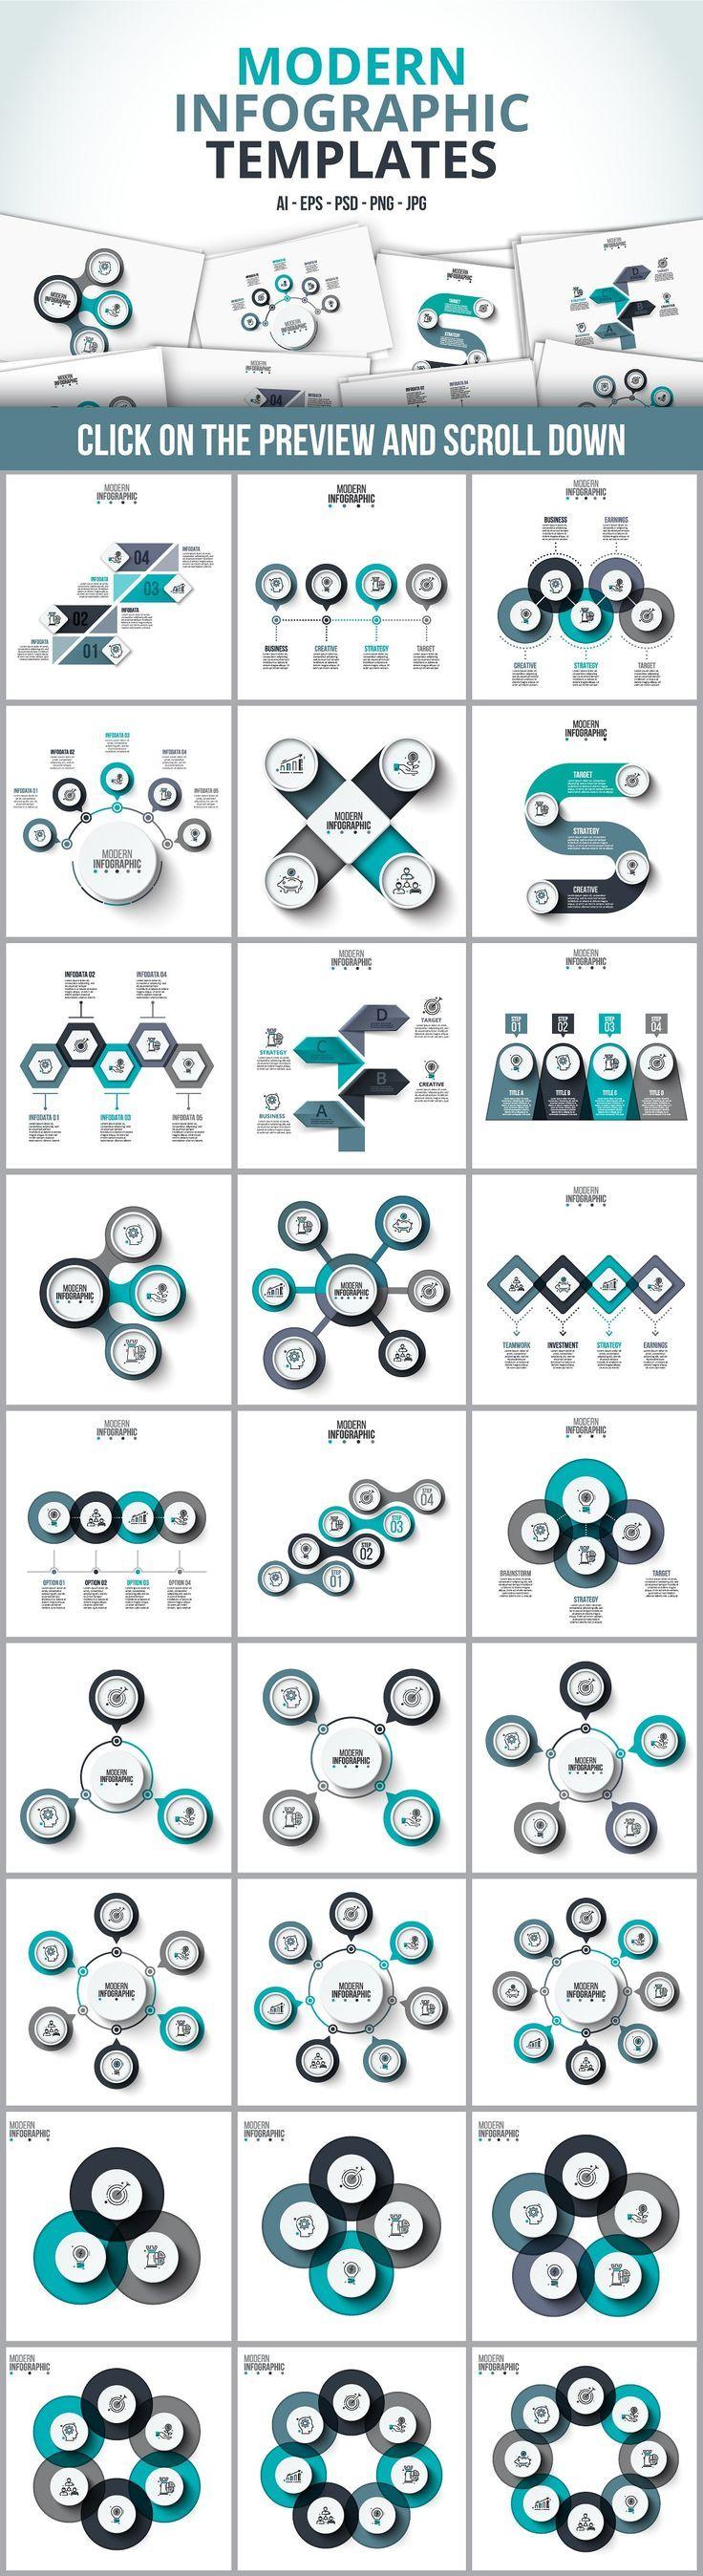 Advertising-Infographics-Infographic-templates-bundle-creative-business-marketing Advertising Infographics : Infographic templates bundle - creative business, marketing design template -by ...